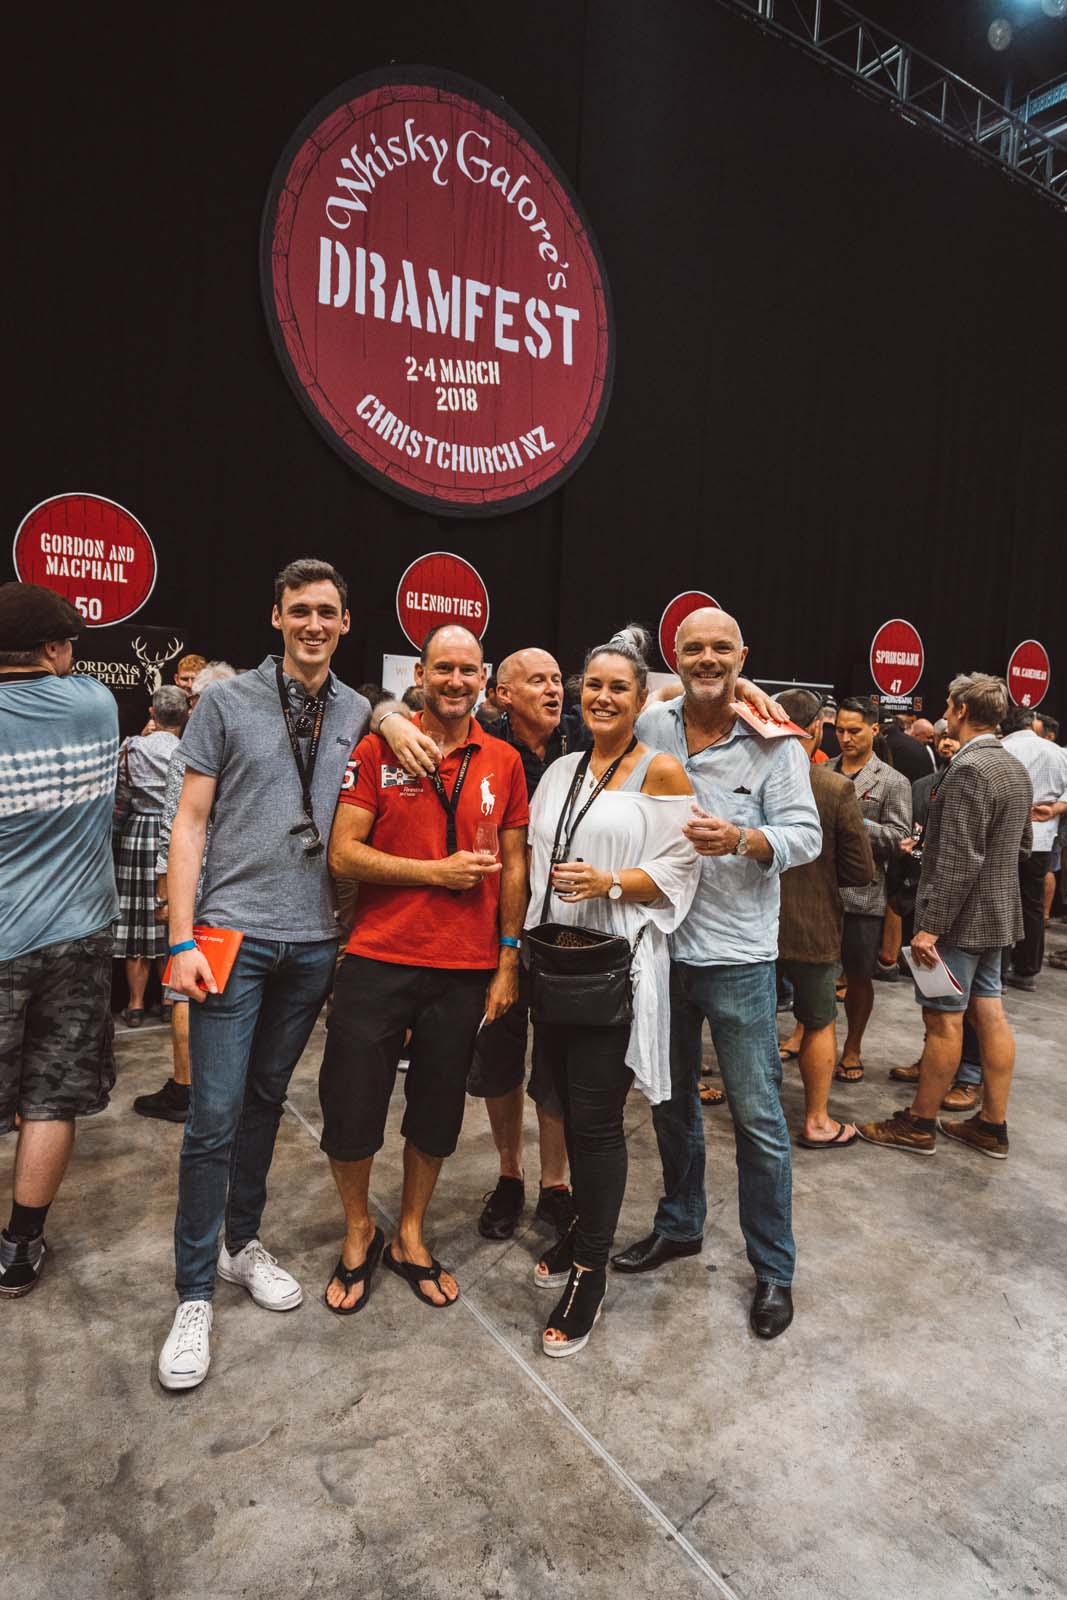 Dramfest 2018 for Whisky Galore-282.jpg